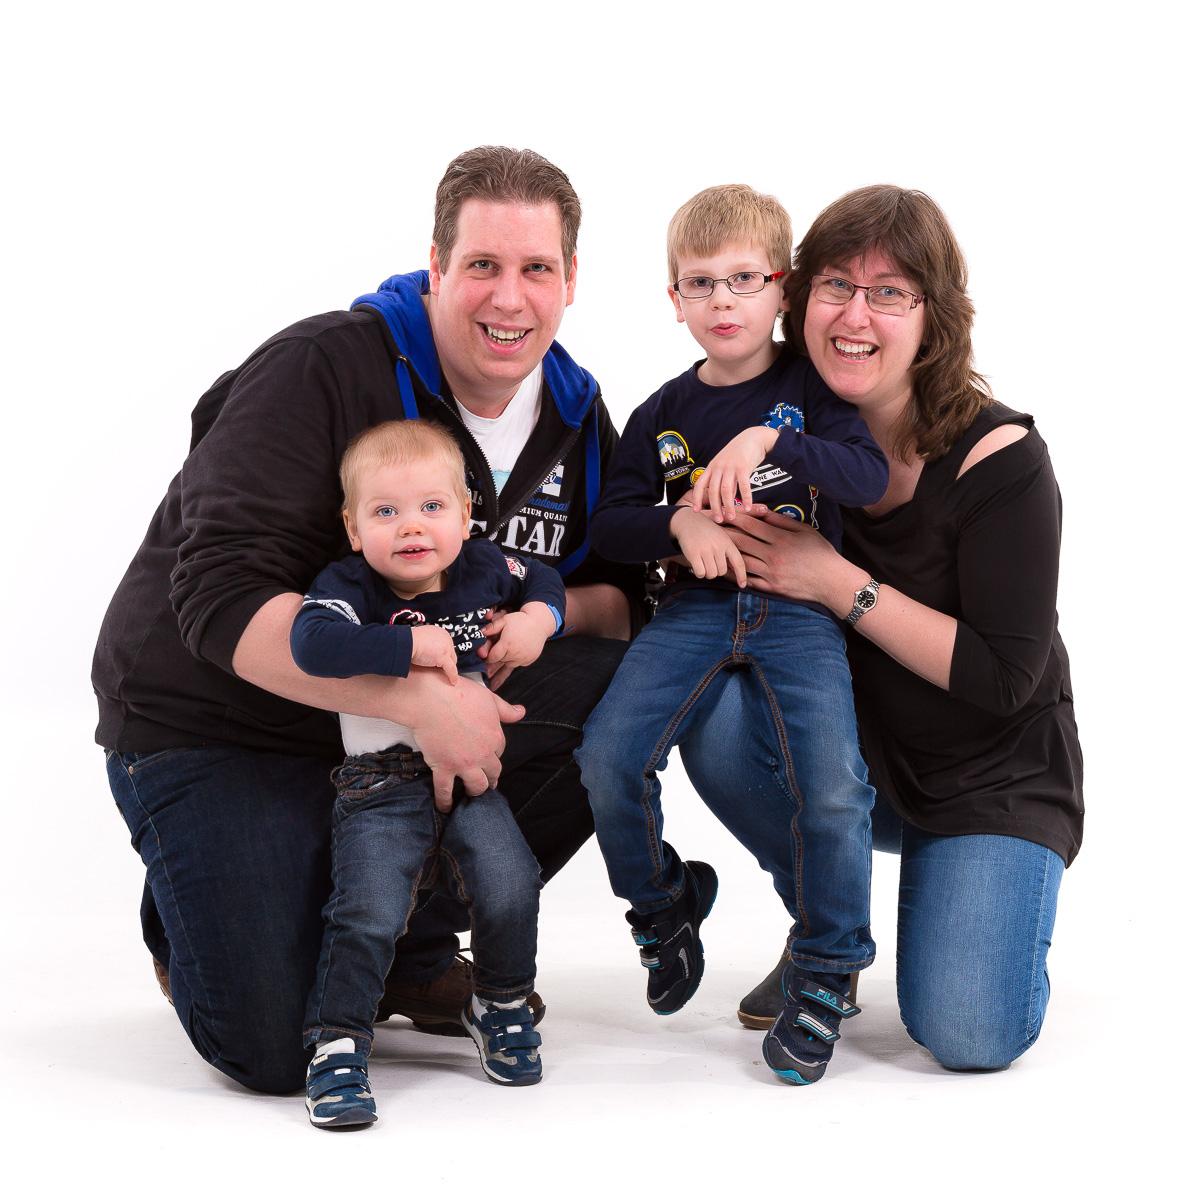 Familie fotoshoots-Portretfotograaf-fotoshoots-Zwijndrecht-Dordrecht-Rotterdam-Zuid Holland-Rikervp-1-5